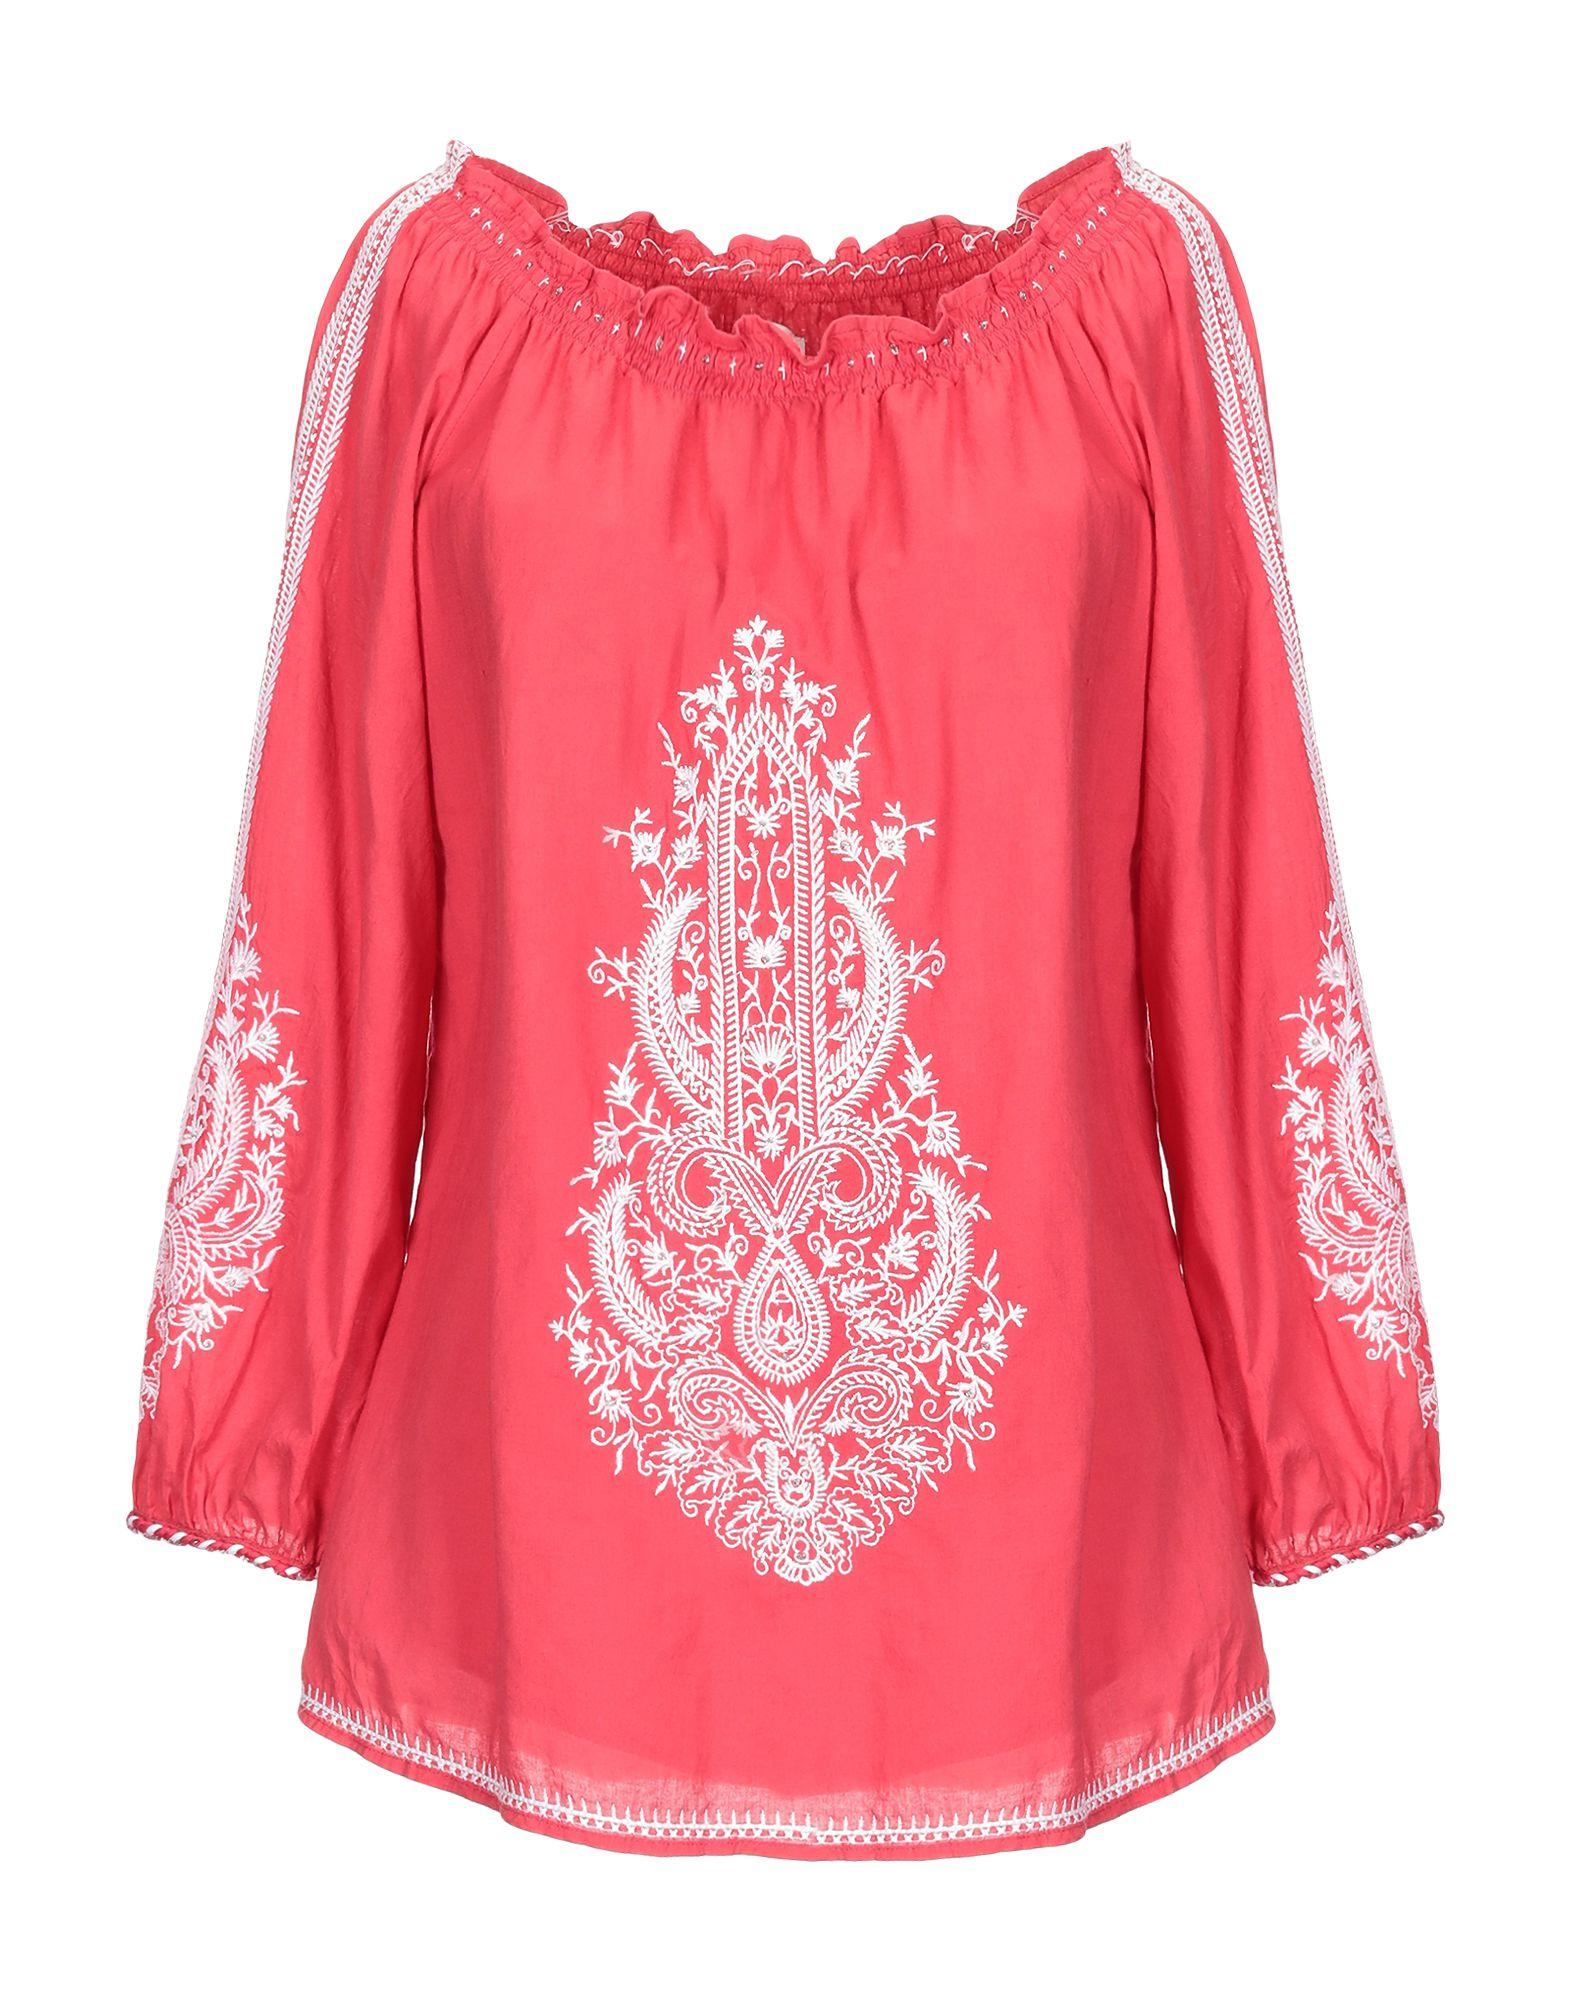 EMMA & GAIA Блузка dress emma monti платья и сарафаны приталенные